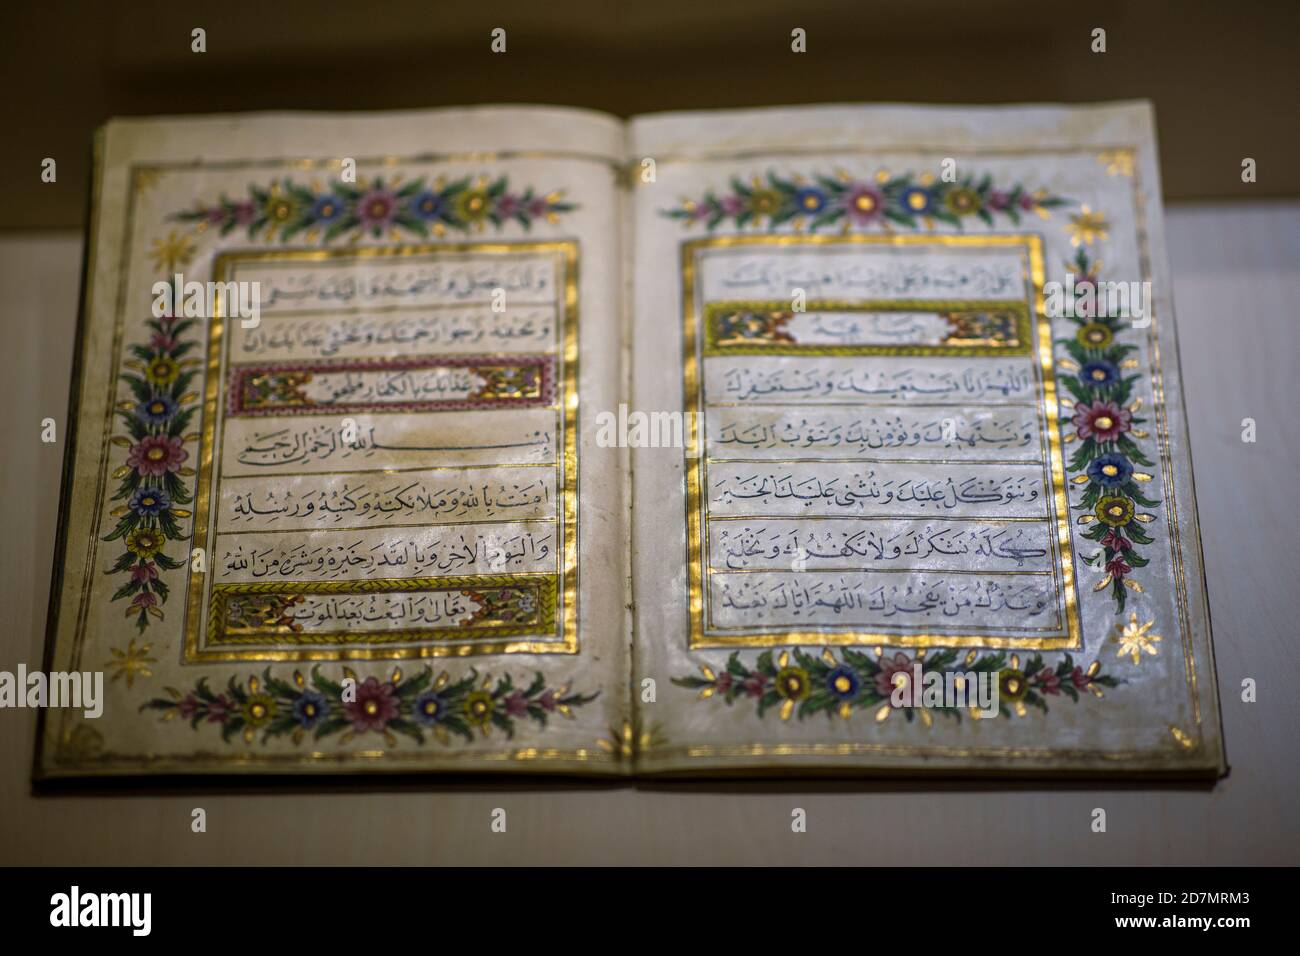 Ankara, Turkey; 08 October 2020: Manuscript Quran view from ancient times Stock Photo